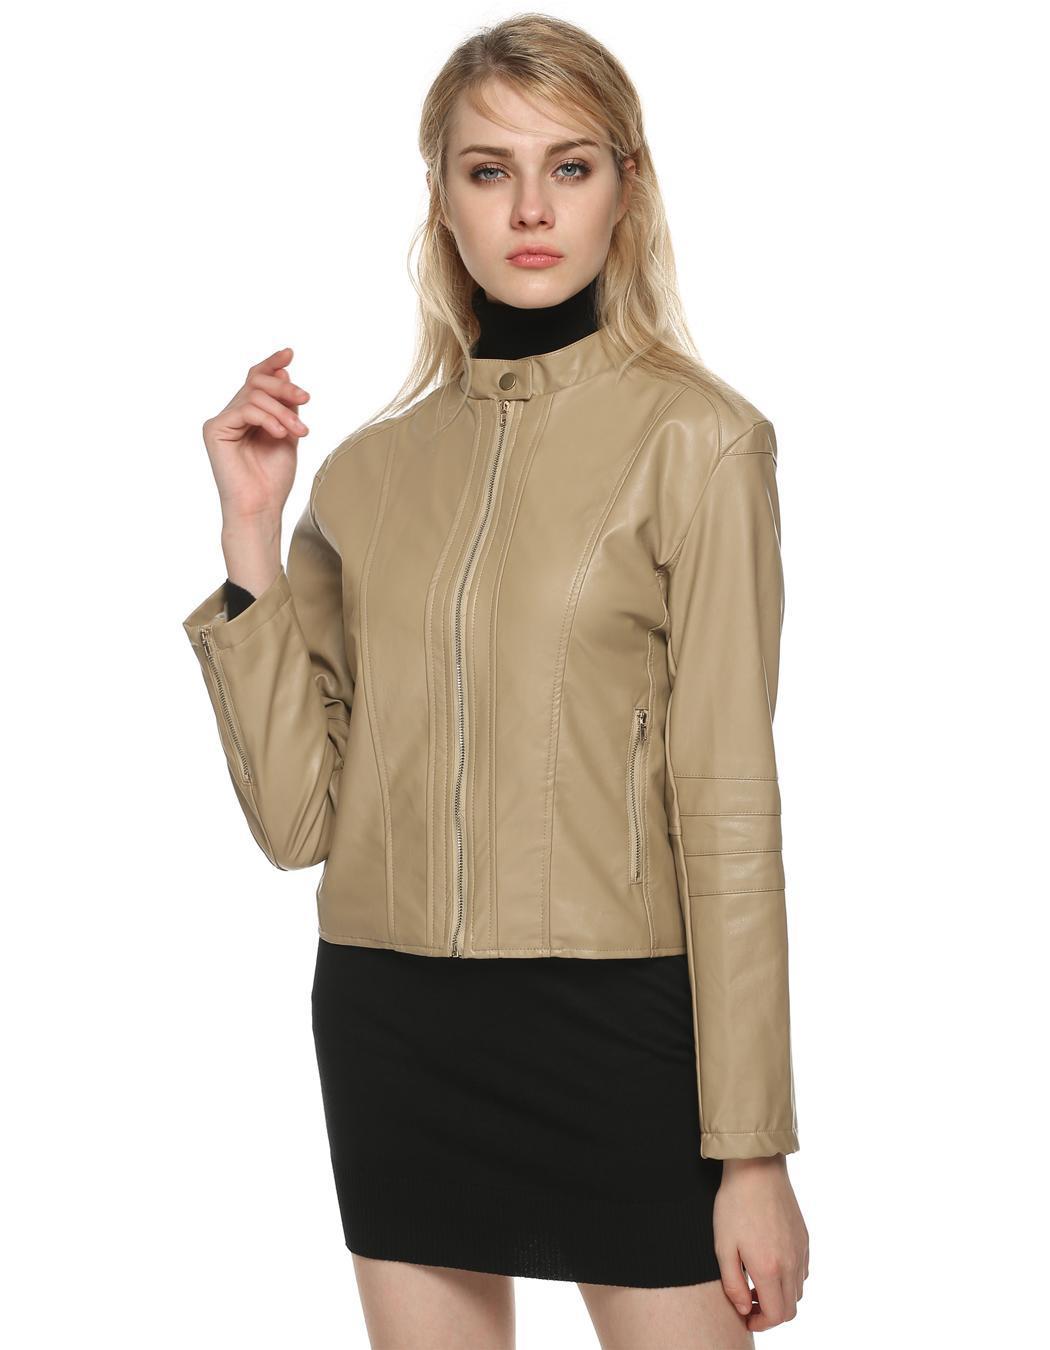 Women Long Sleeve Synthetic Leather Casual Bike Jacket Short Coat 1